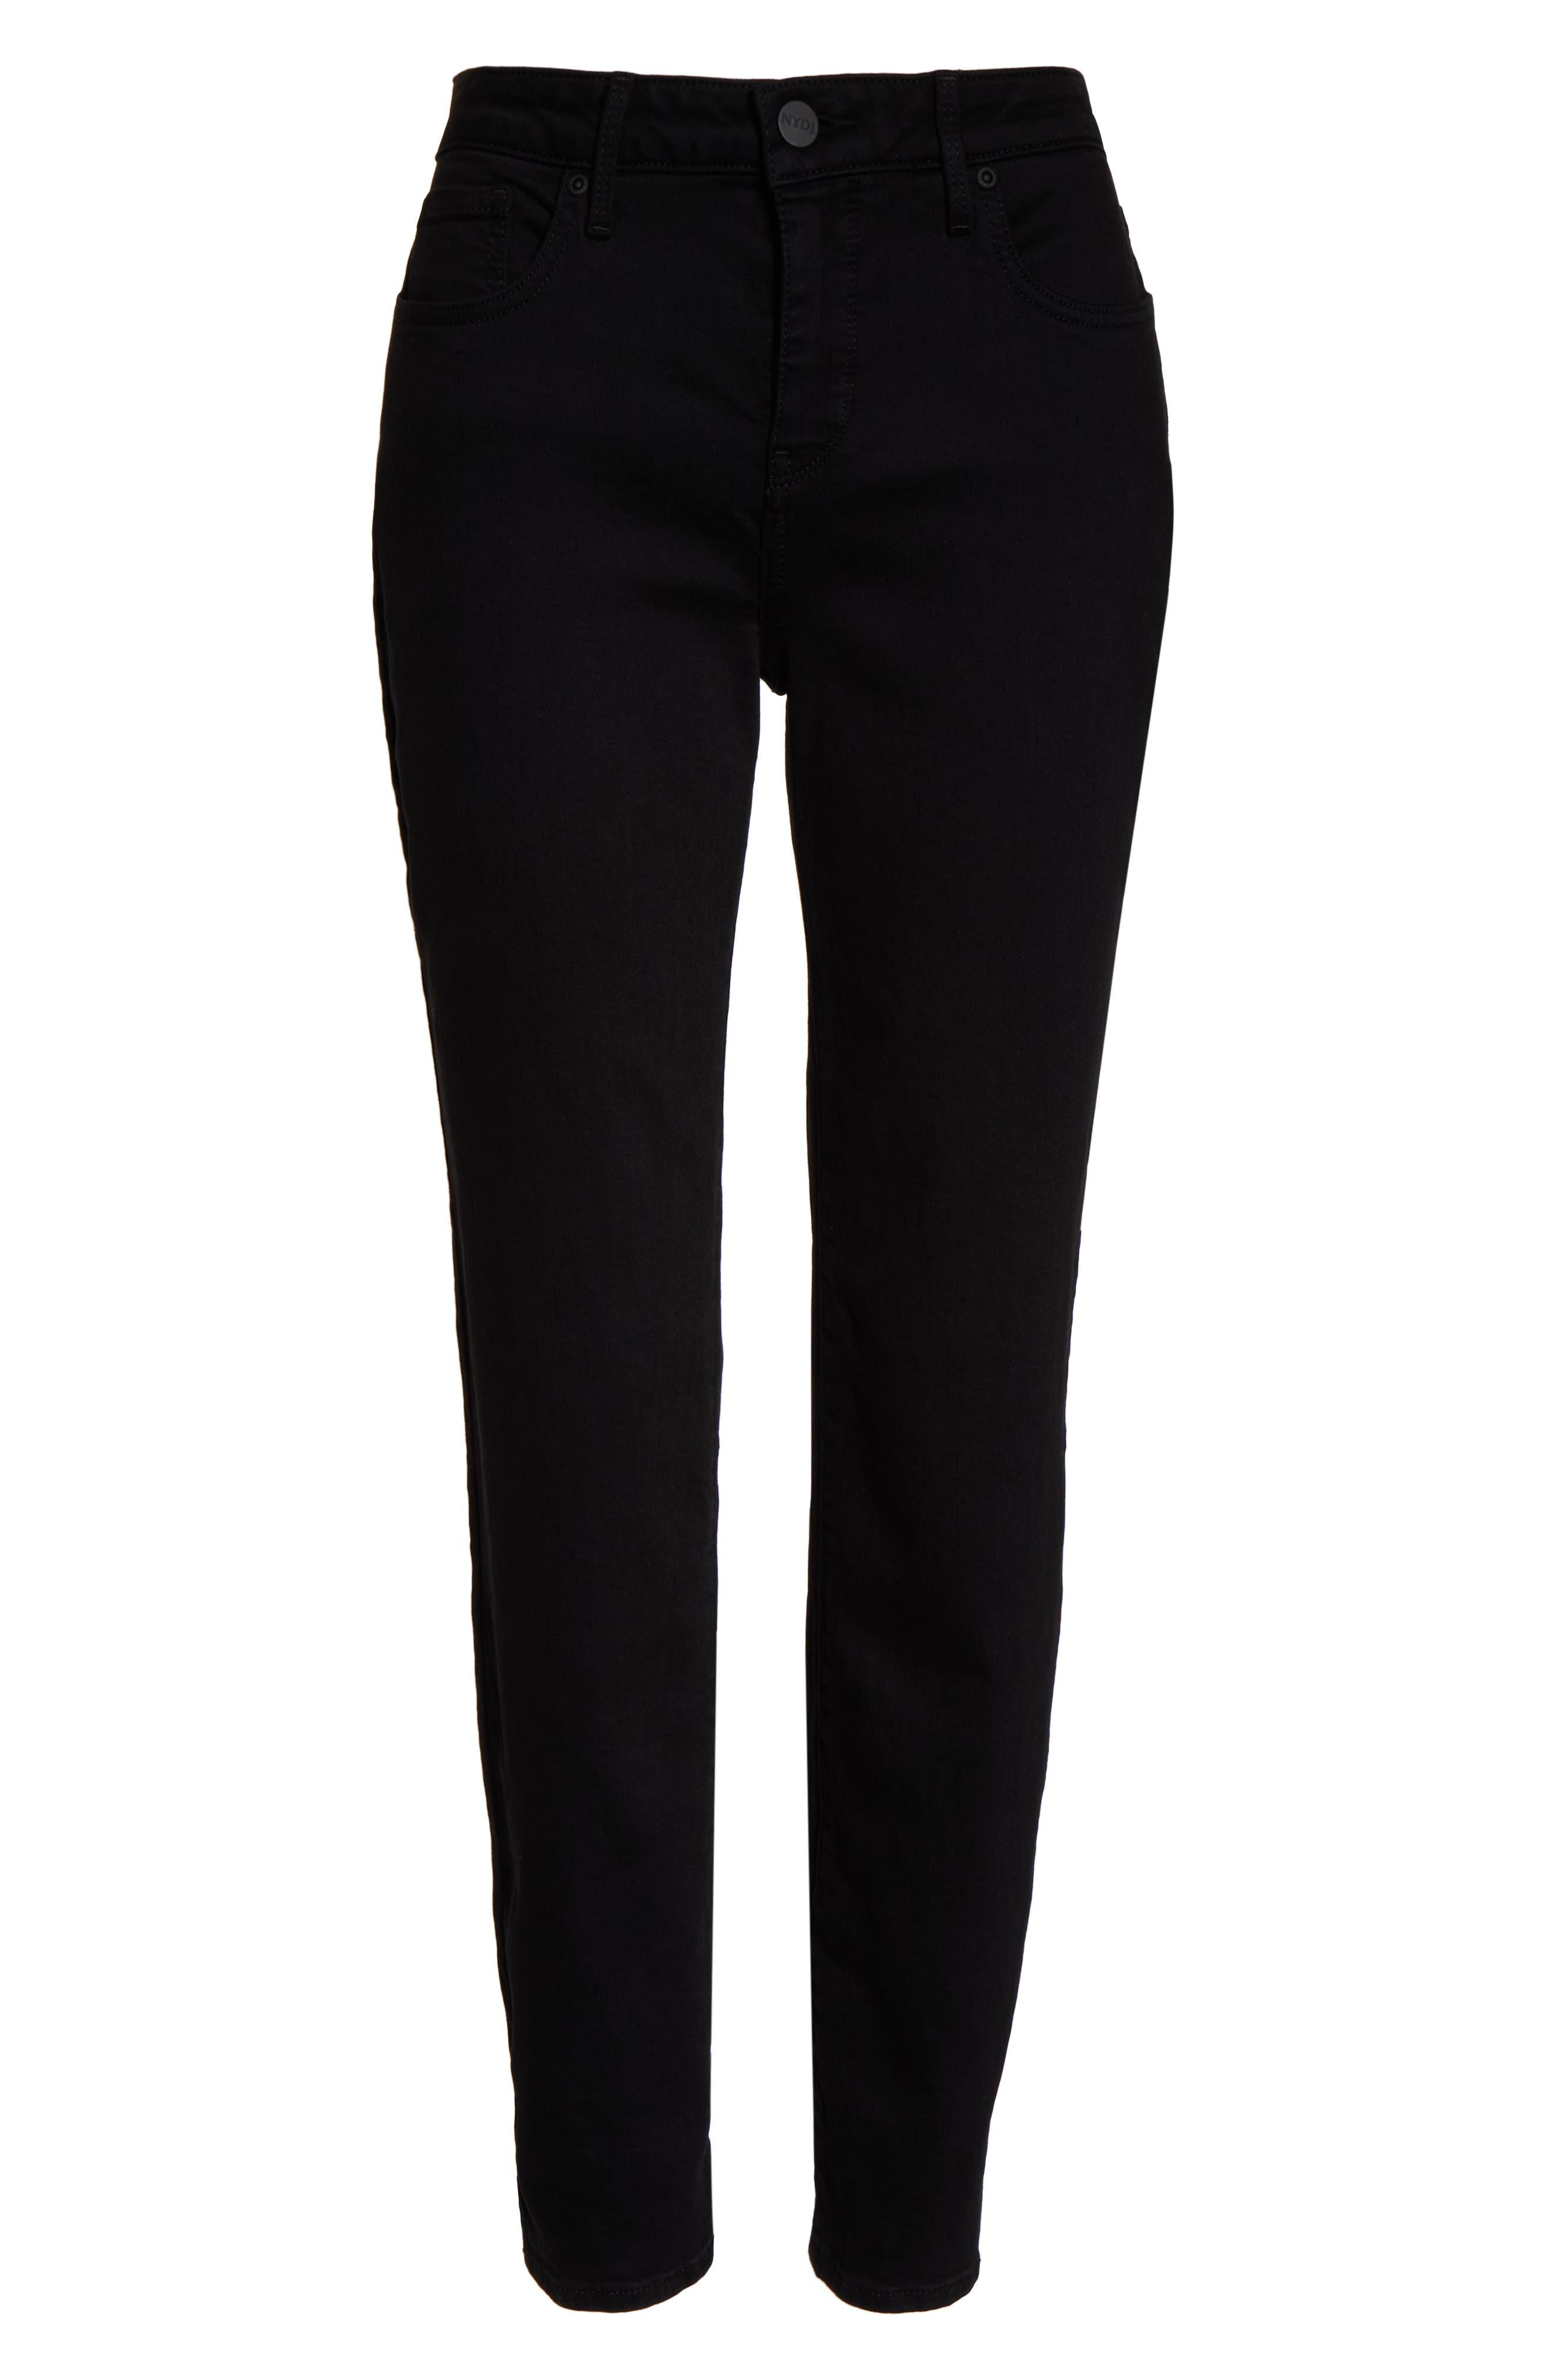 CURVES 360 BY NYDJ, Slim Straight Leg Ankle Jeans, Alternate thumbnail 5, color, BLACK